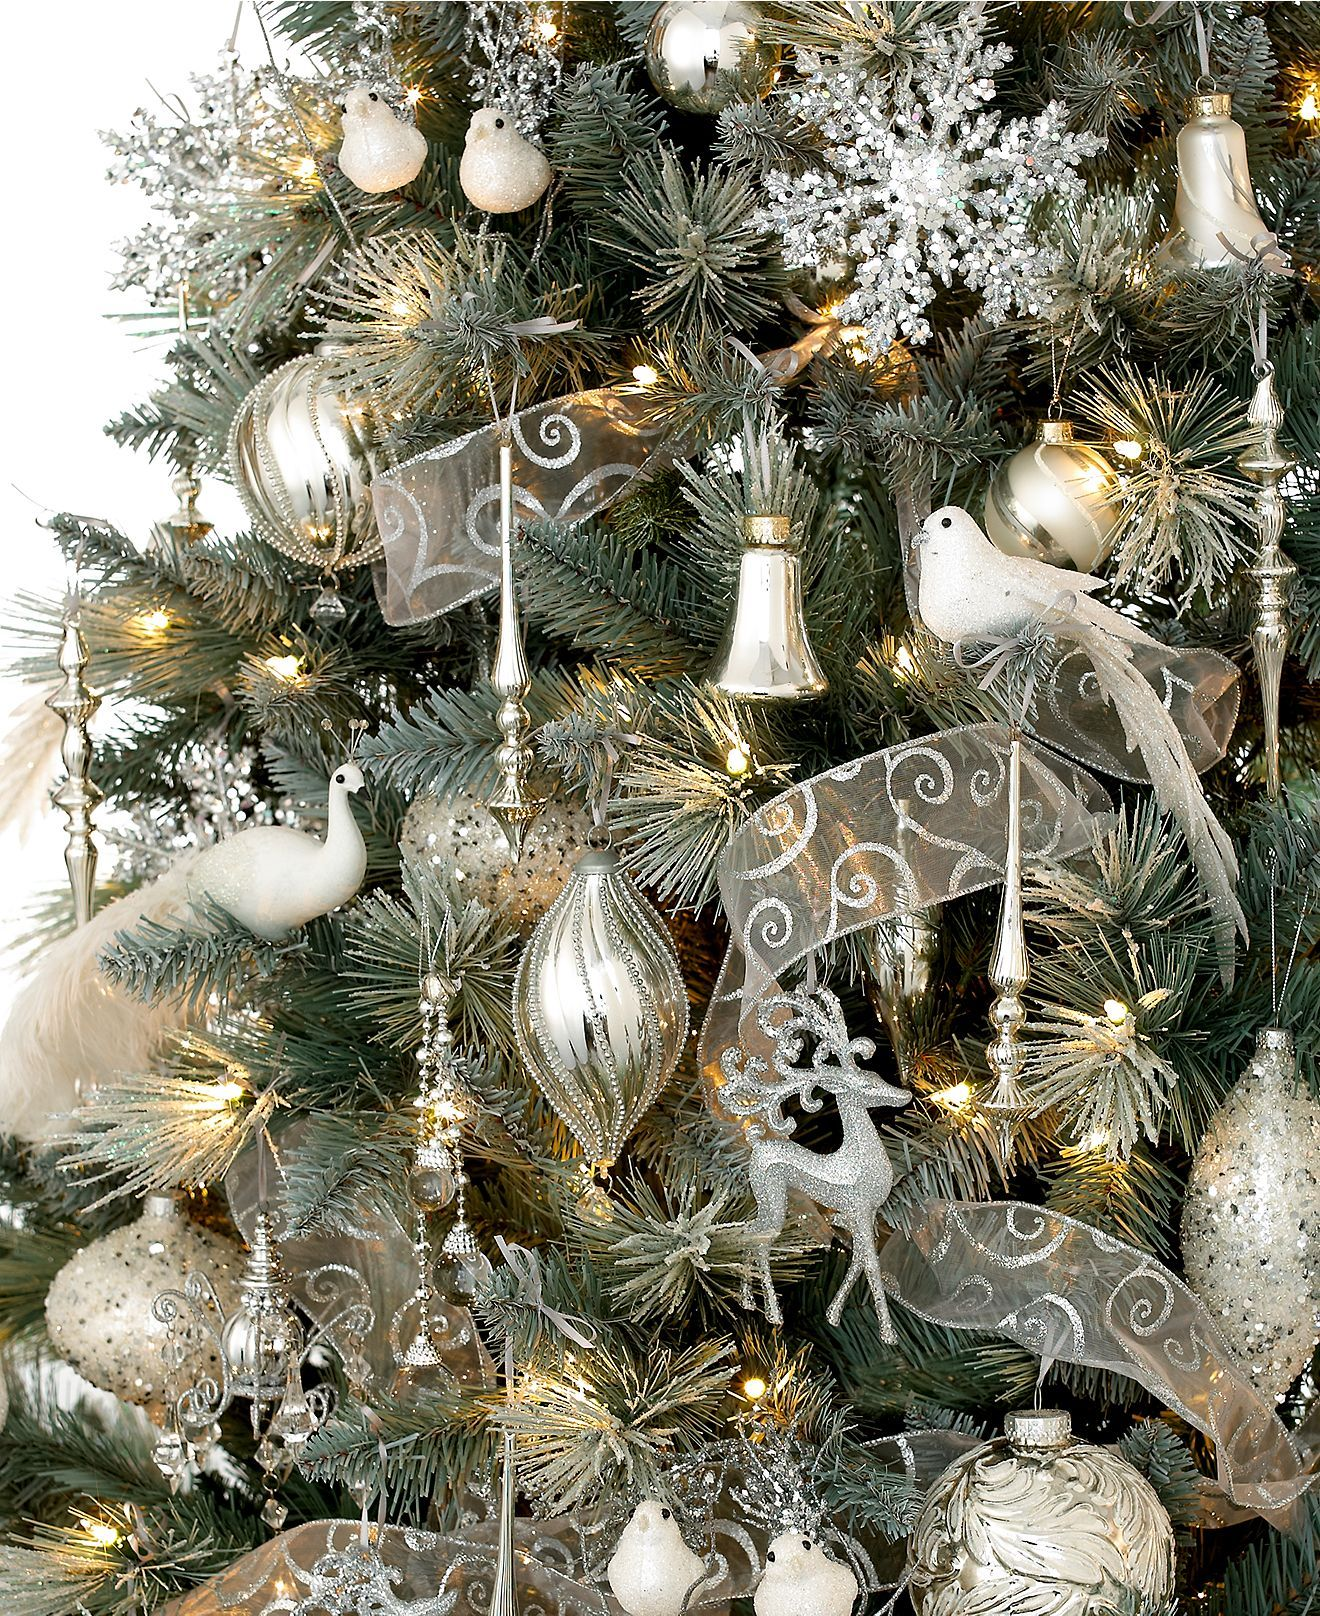 Winter Themed Christmas Decorations: Holiday Lane Christmas Ornaments, Winter Wonderland Tree